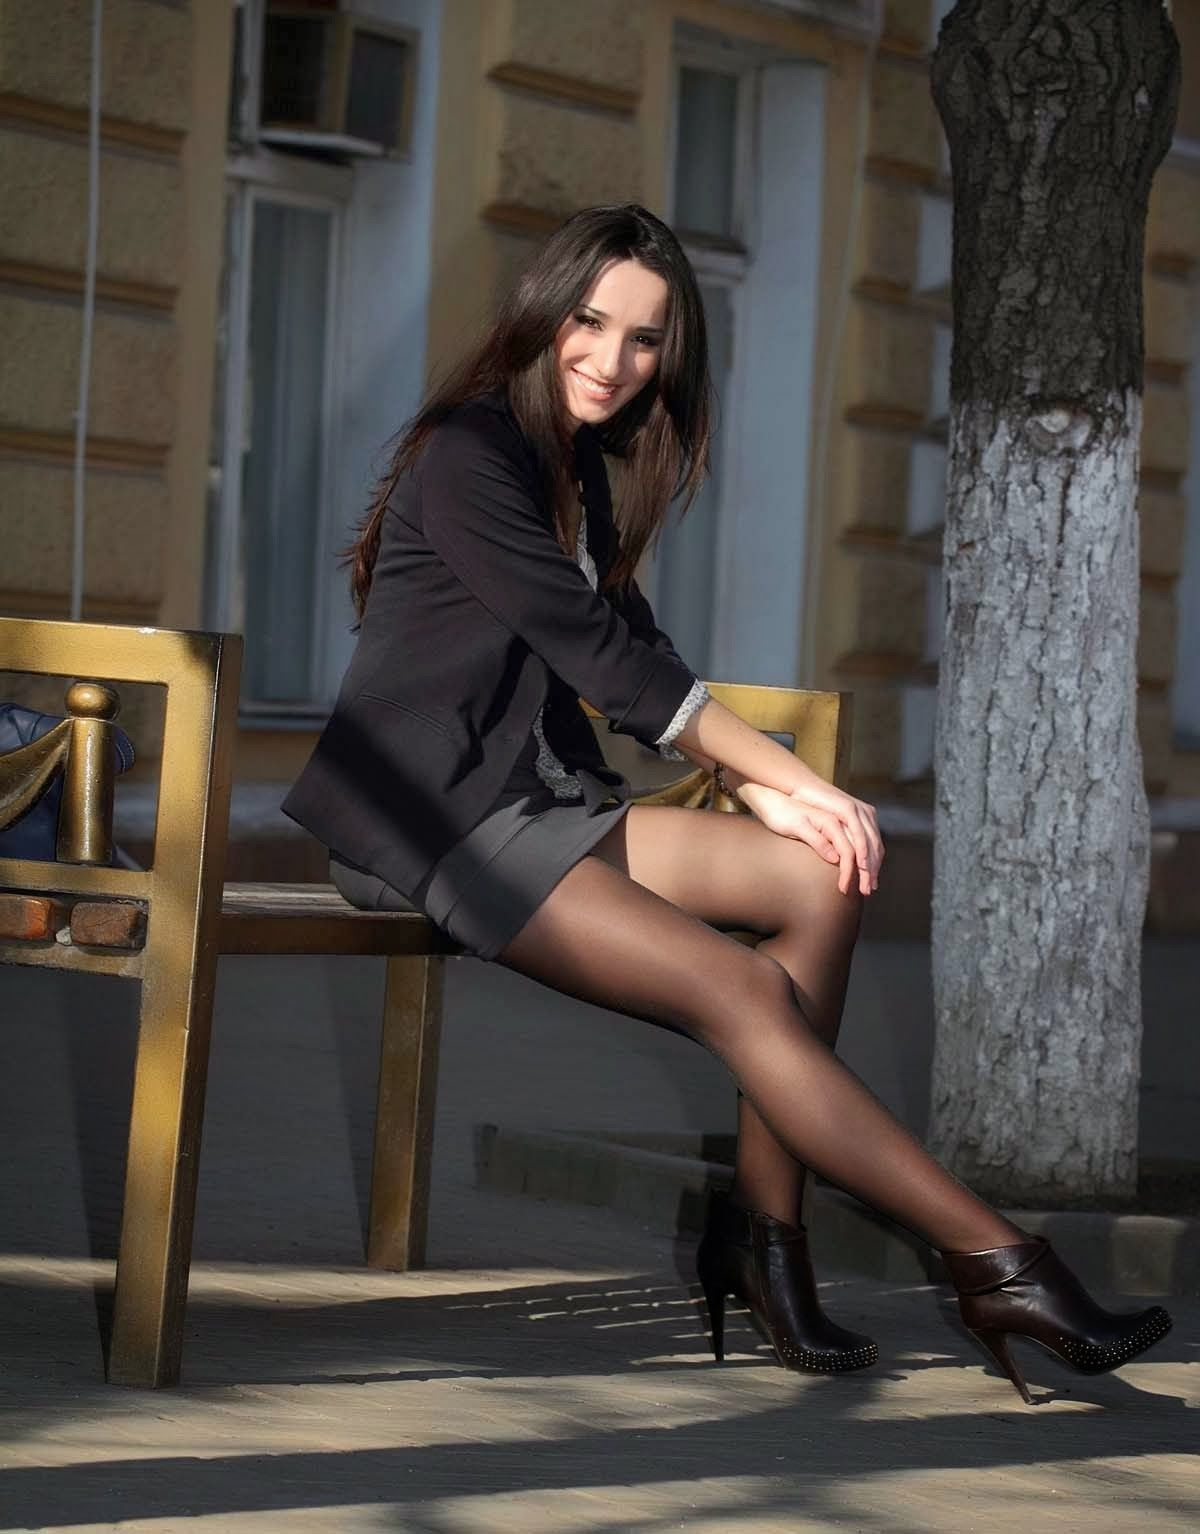 pantyhose-high-heels-skirts-tanisha-nudes-and-fucking